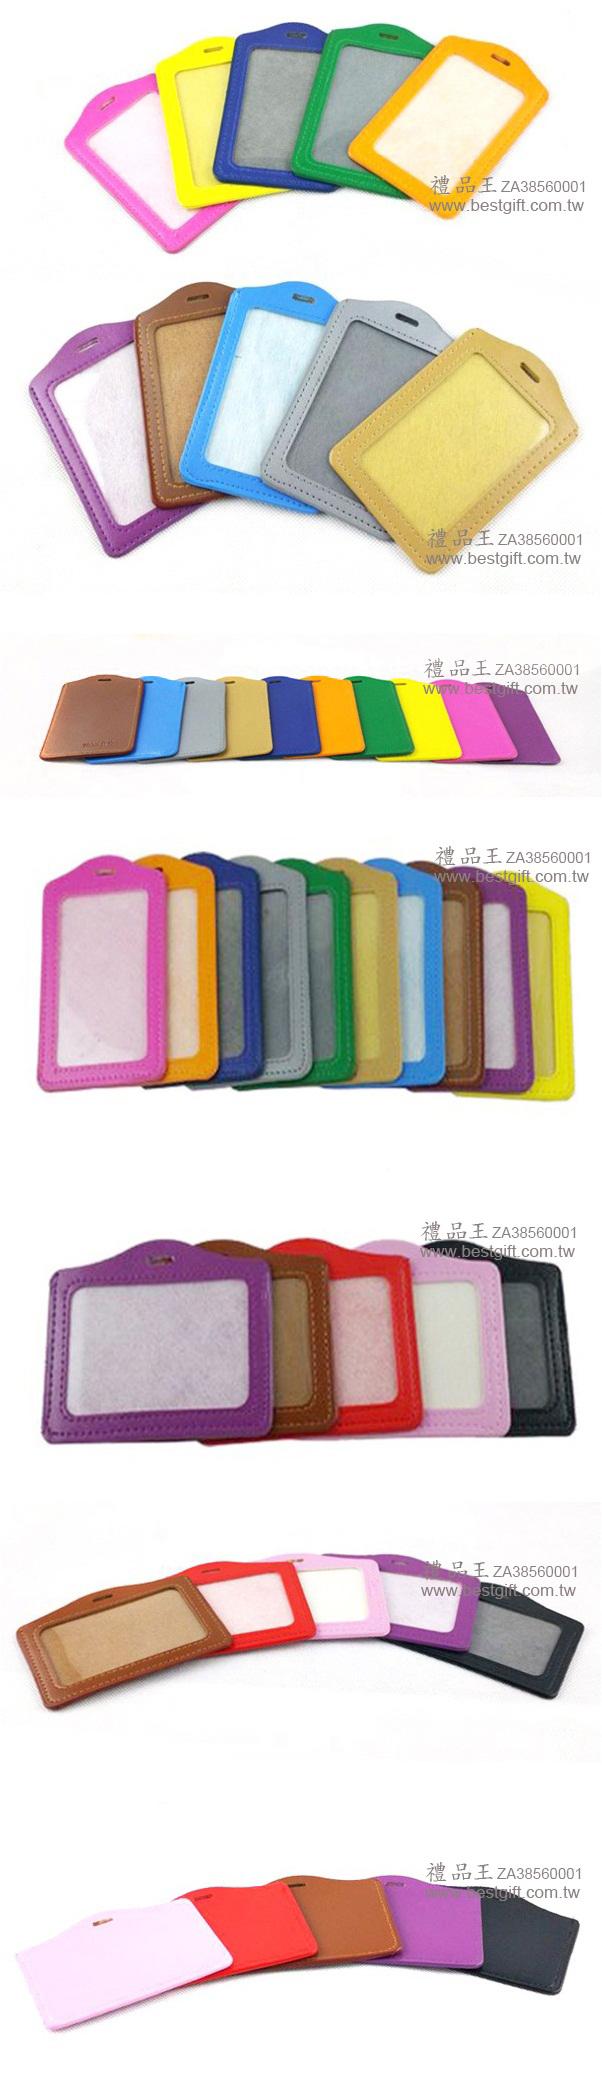 PVC證件卡套     商品貨號:ZA38560001